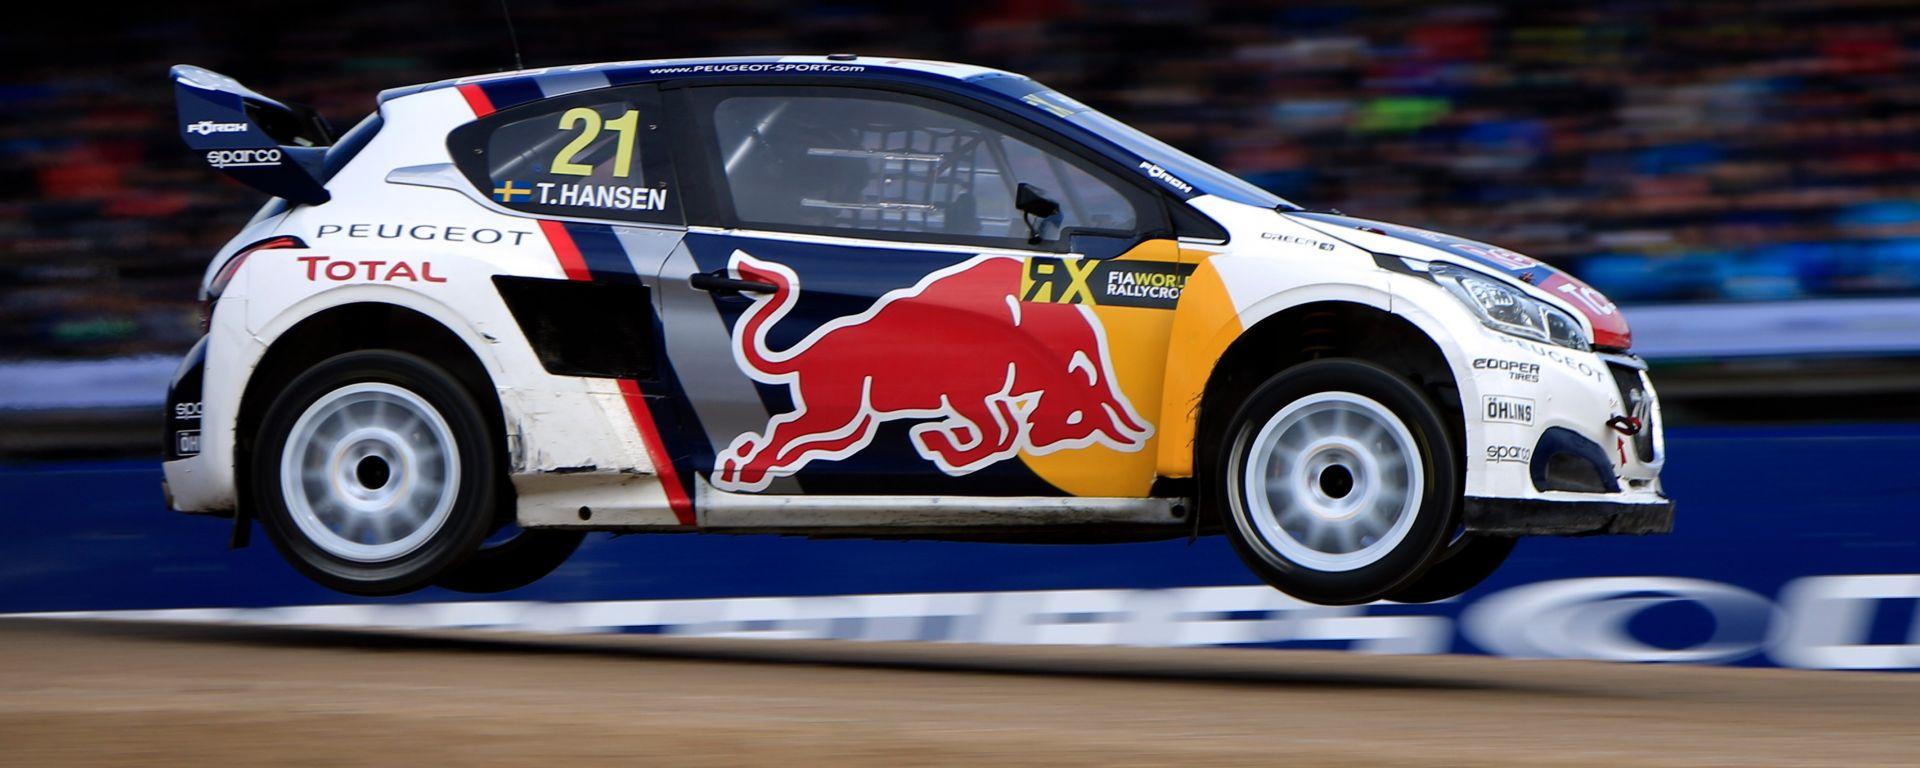 Timmy Hansen ha avuto un weekend difficile a Riga - Rallycross 2017